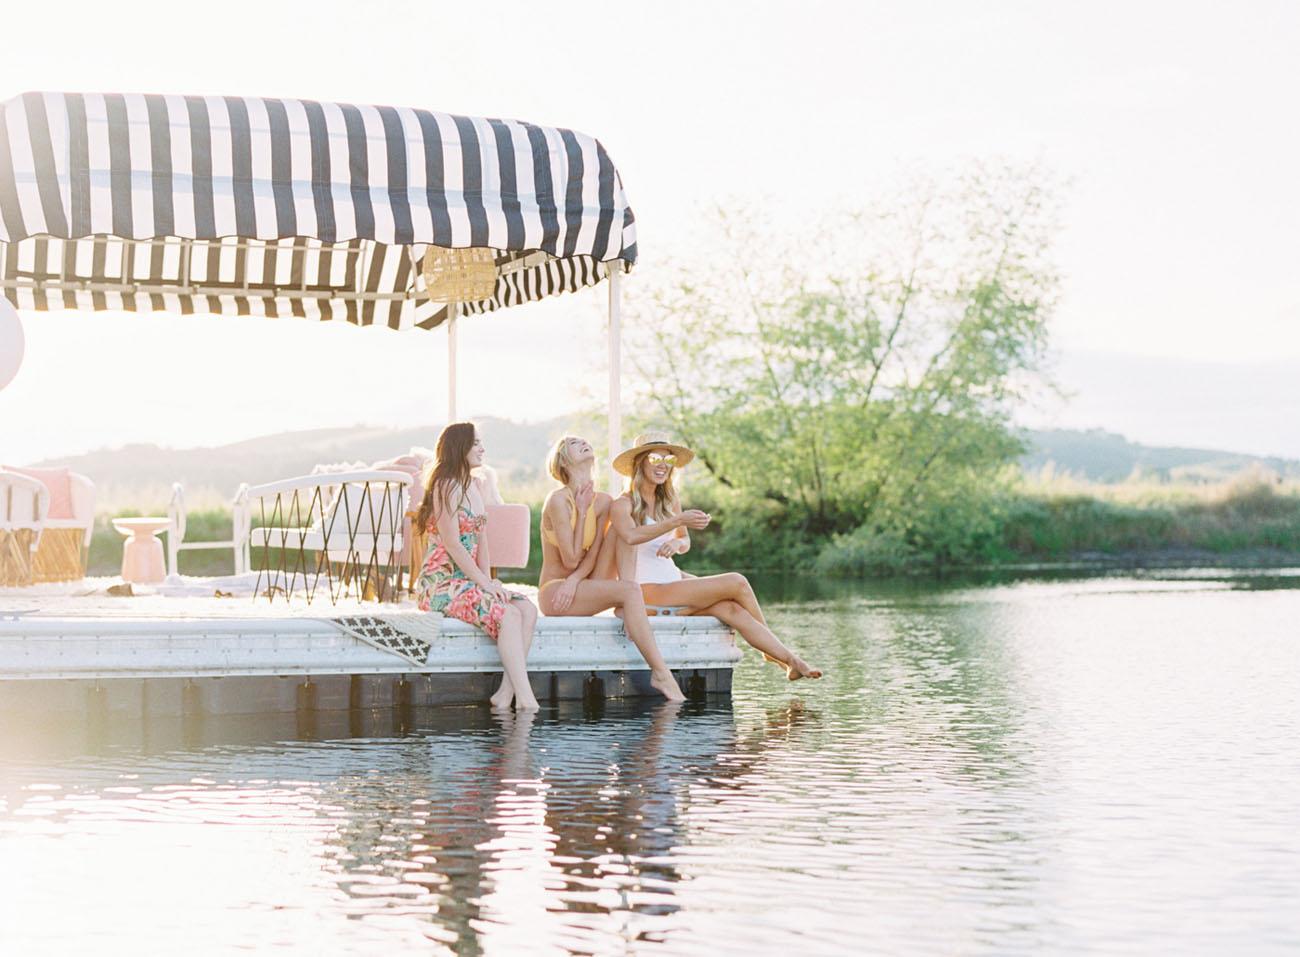 Bachelorette Campfest Inspiration